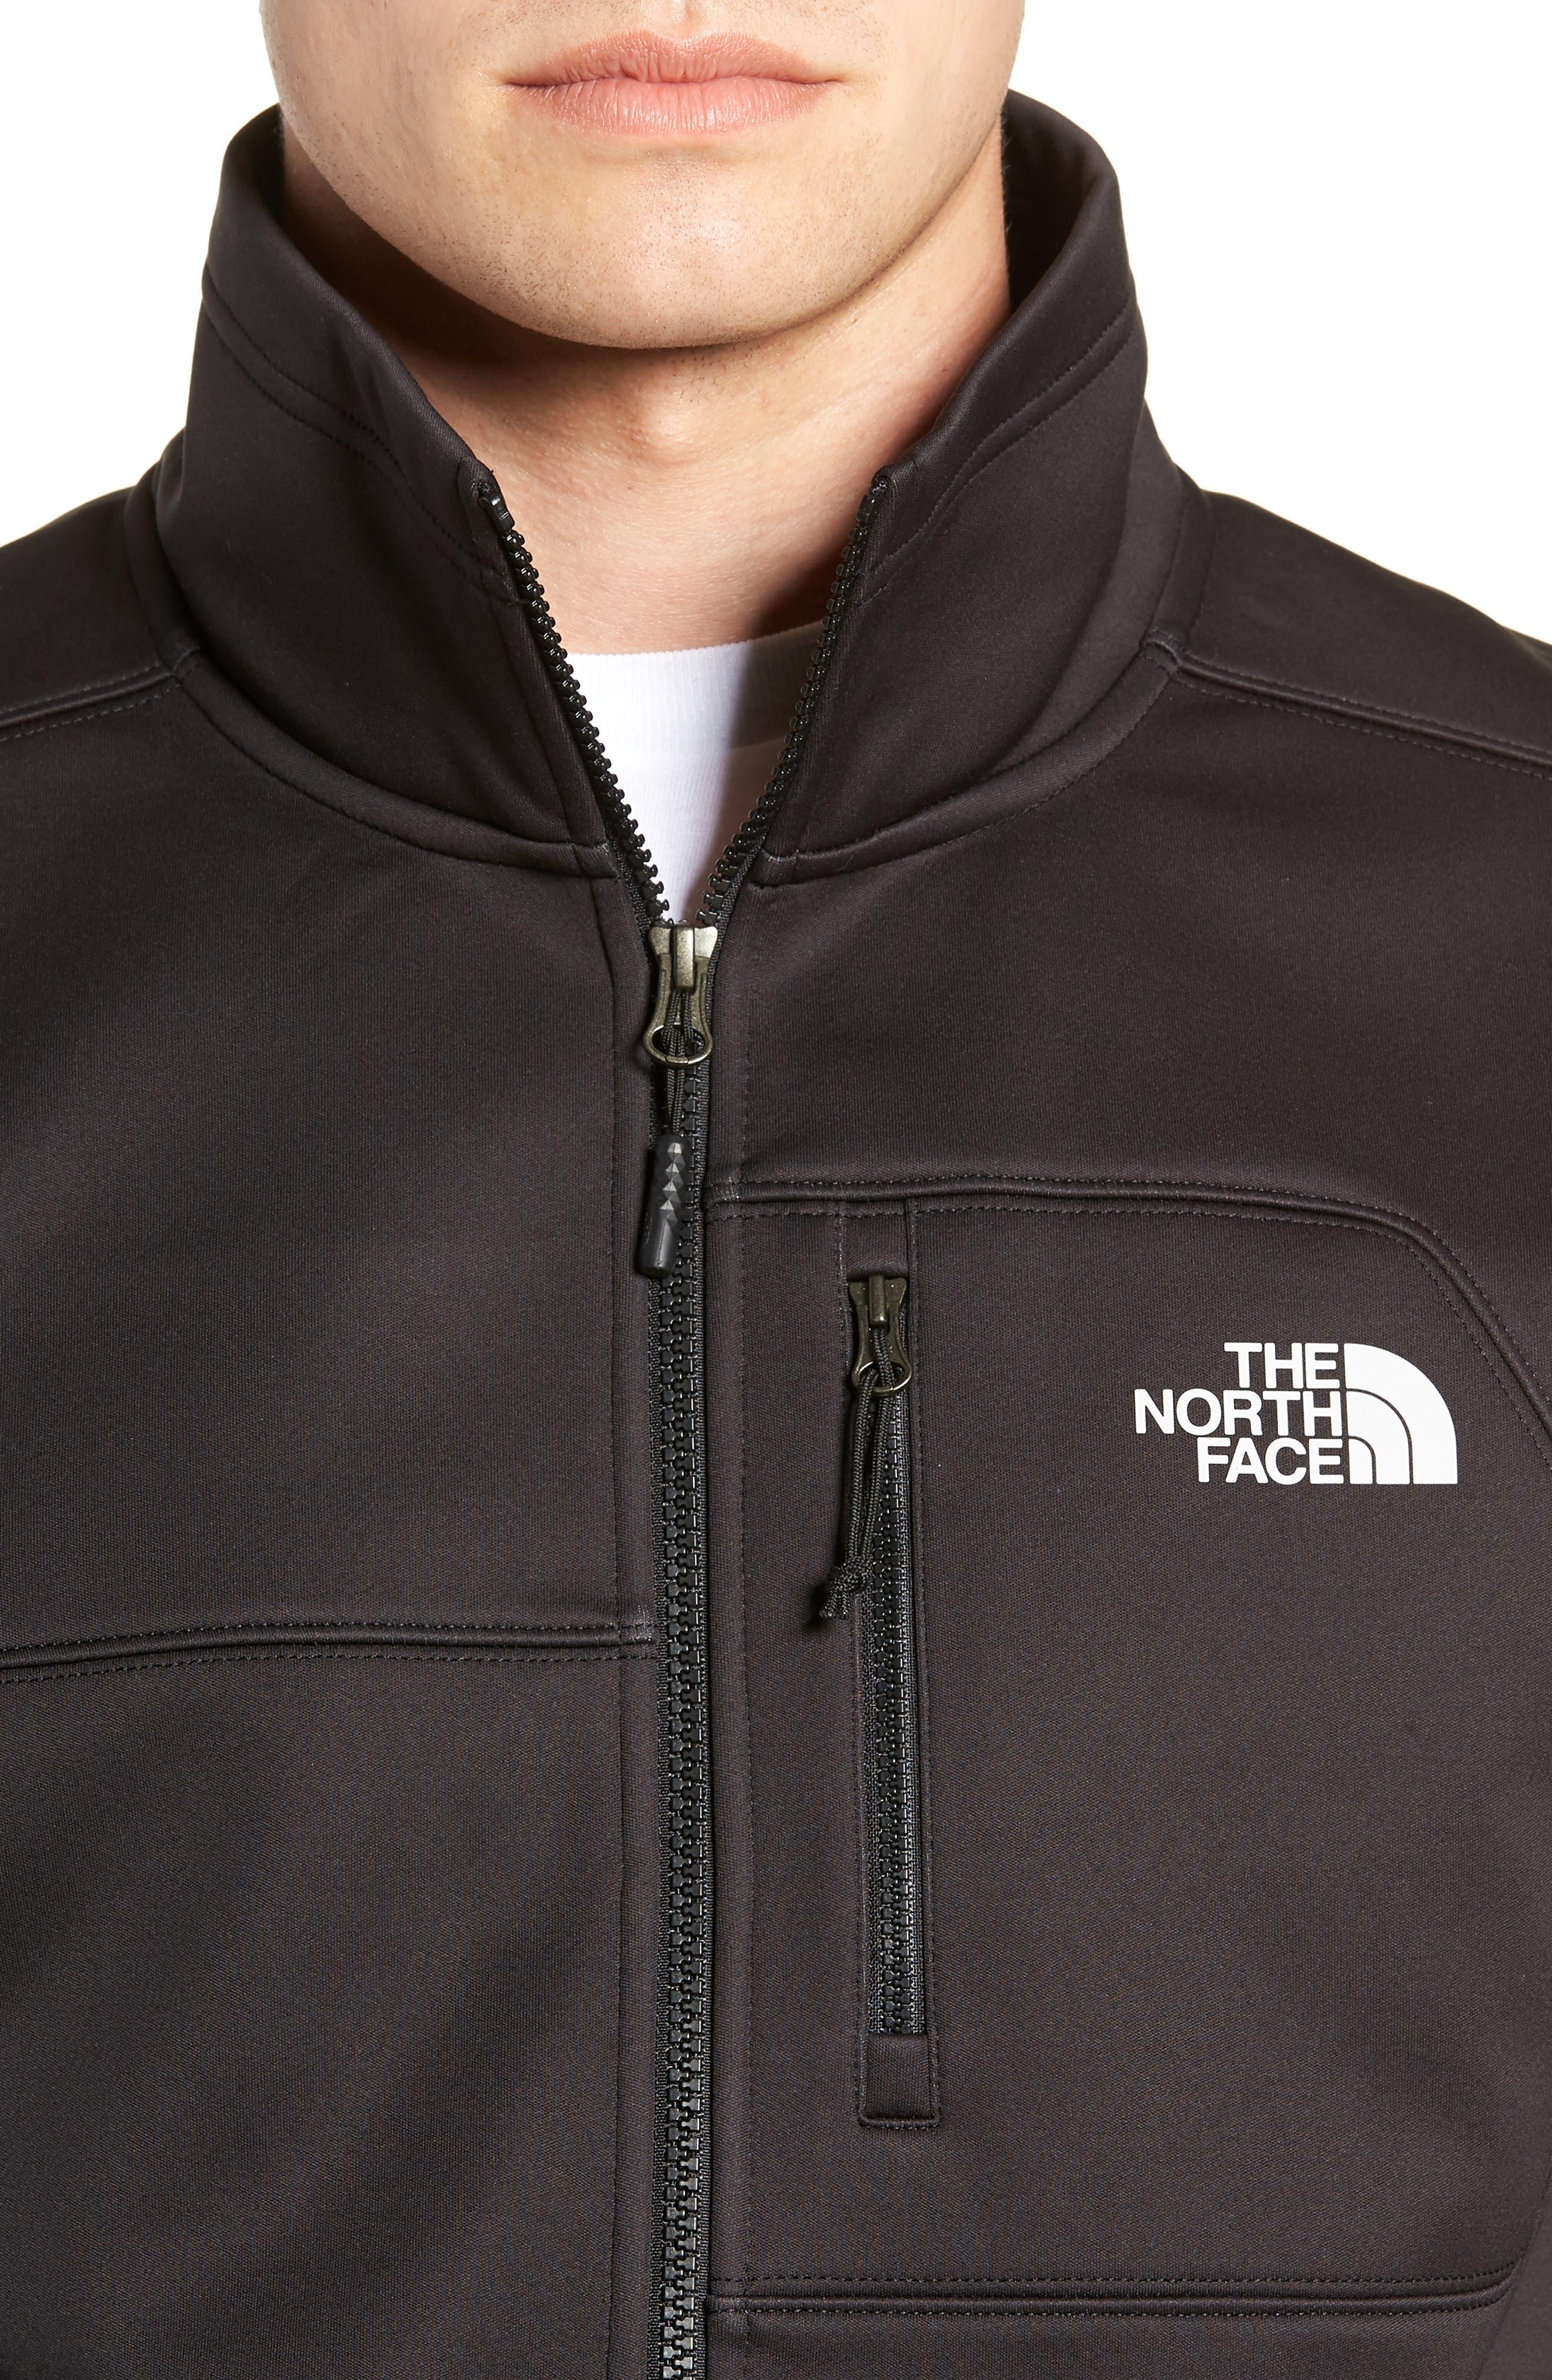 THE NORTH FACE, Apex Risor Jacket, Alternate thumbnail 5, color, 001